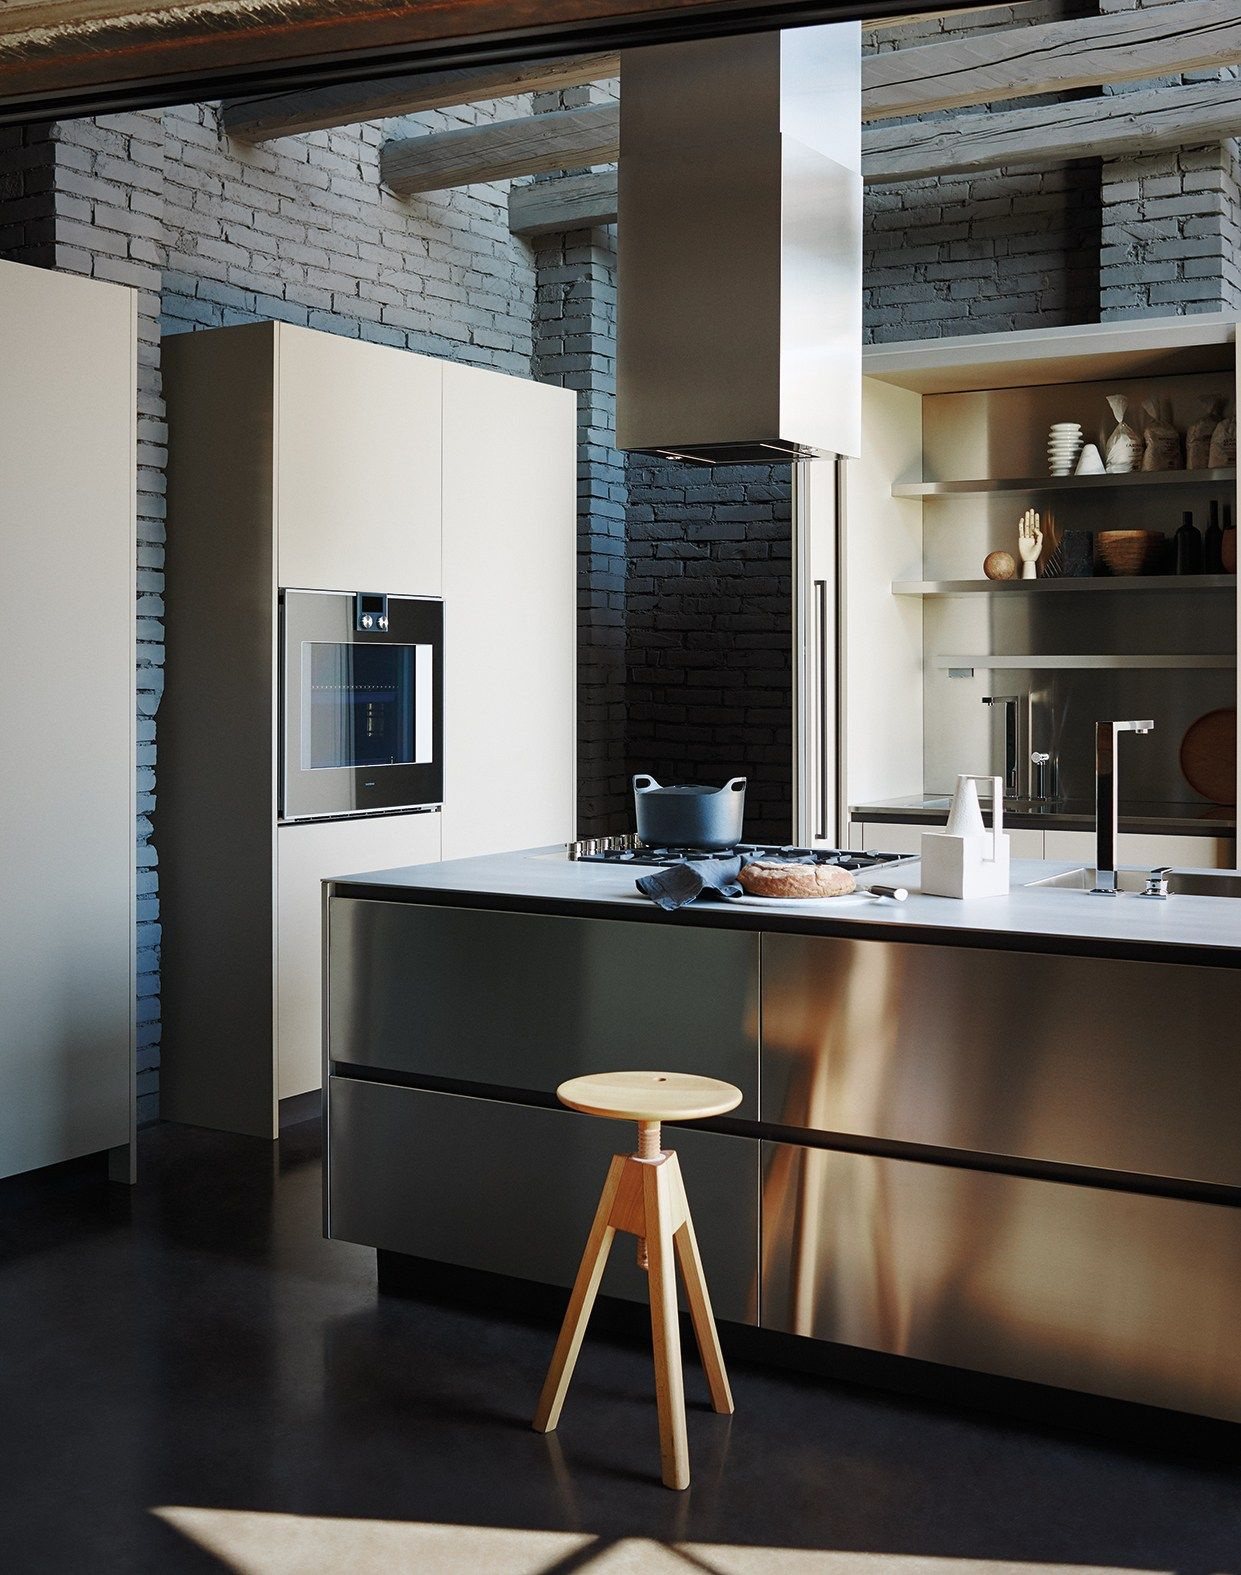 Stainless Steel And Fenix Fitted Kitchen With Island Maxima 2 2 Composition 2 Cesarkitchen Arredo Interni Cucina Progetti Di Cucine Cucine Bellissime